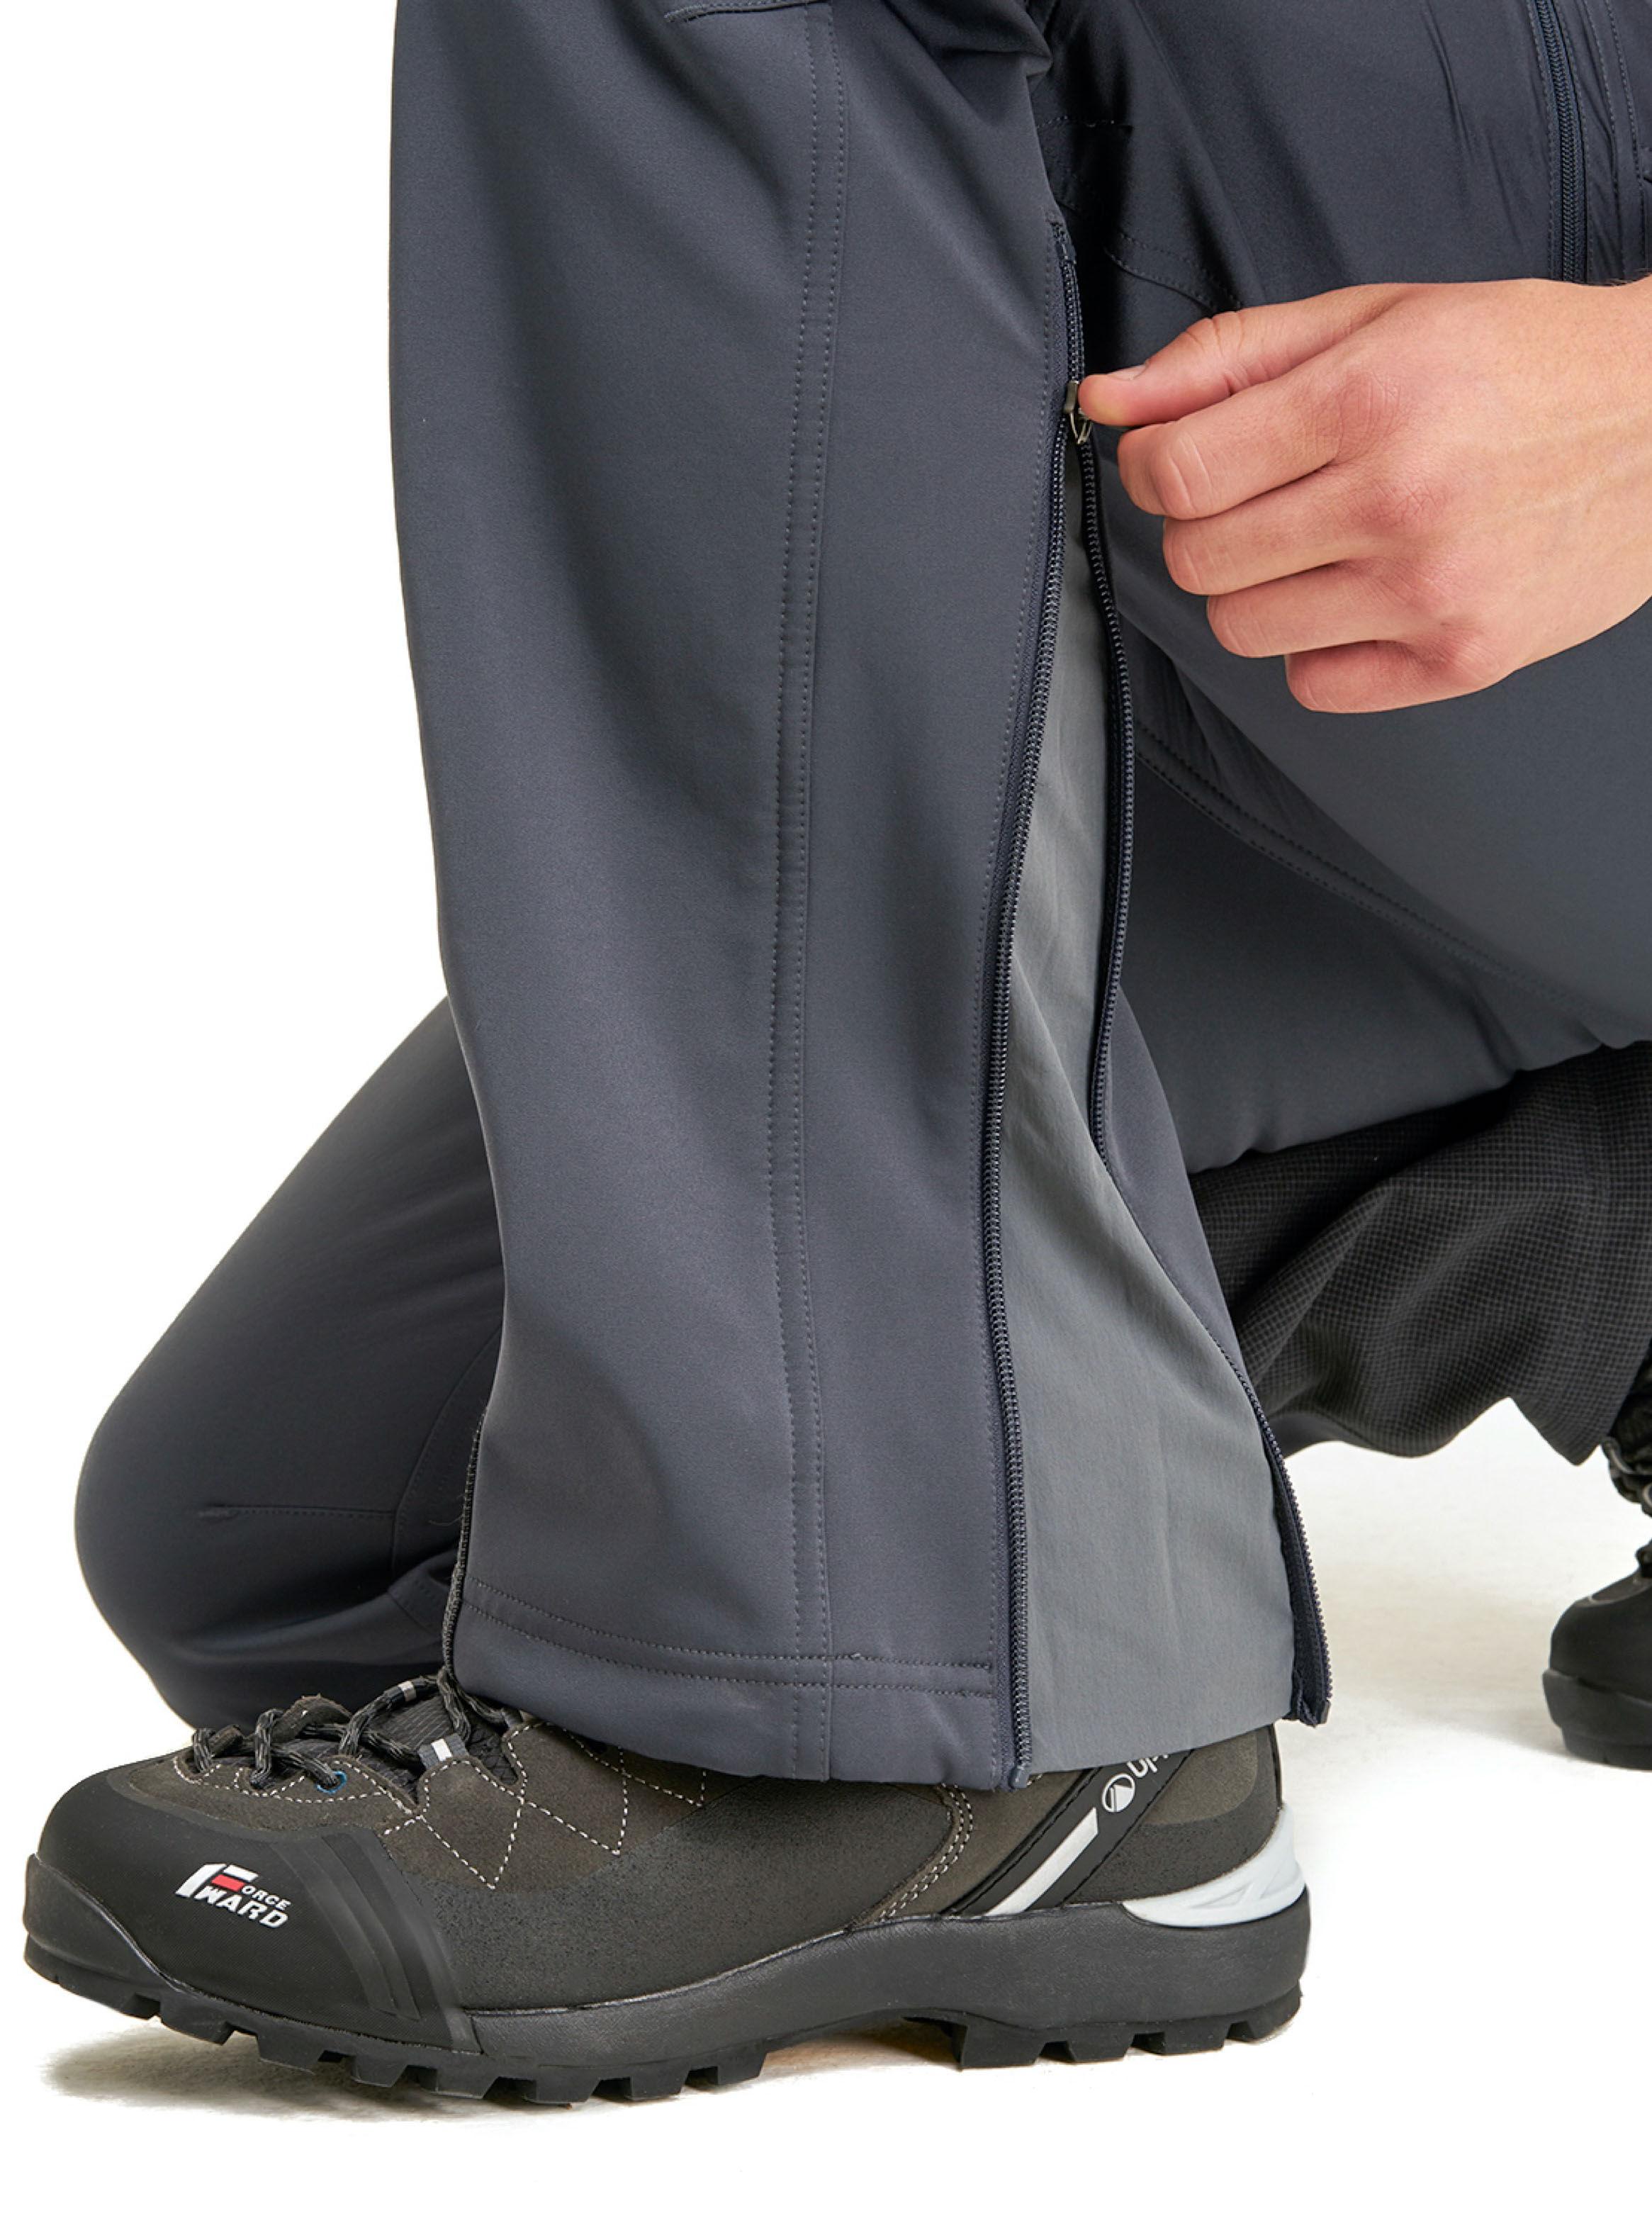 Pantalones Termicos Mujer Lippi Off 50